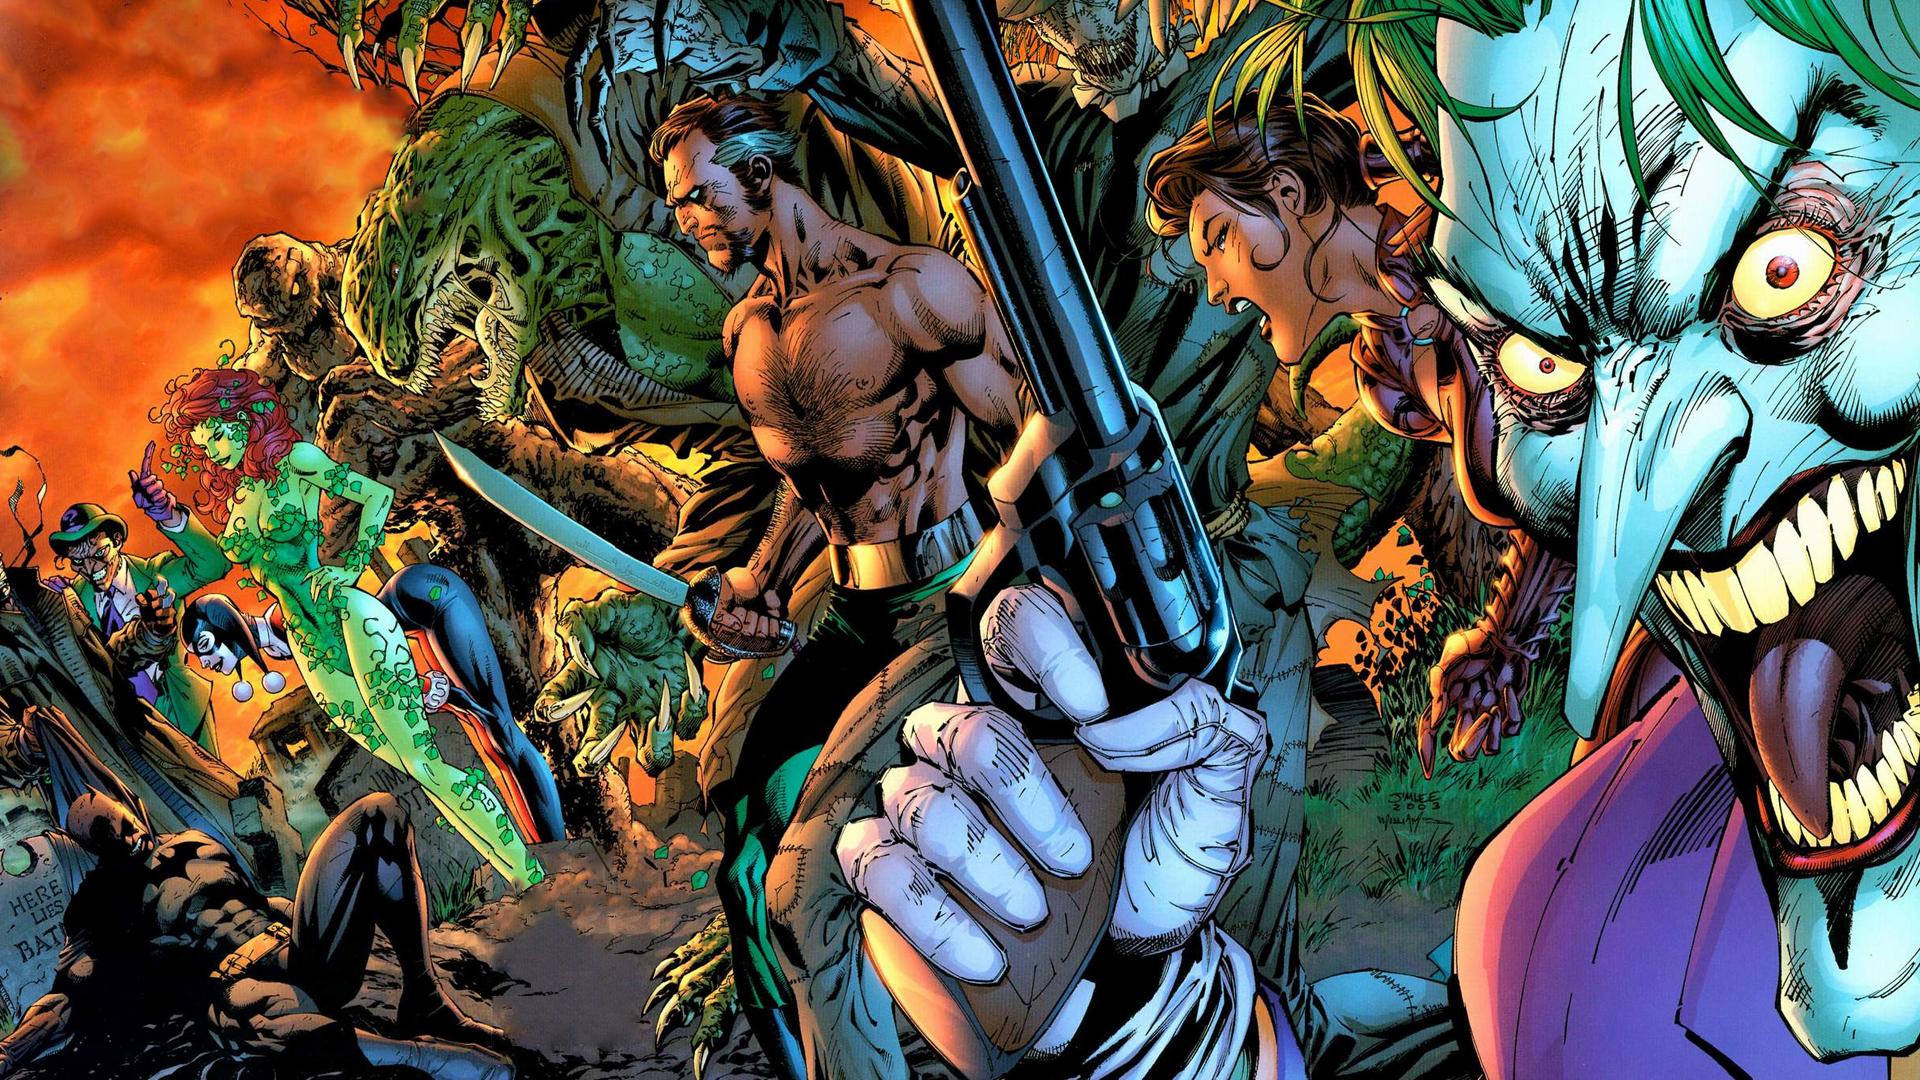 General 1920x1080 DC Comics Joker Talia al Ghul Ra's Al Ghul Scarecrow (character) Killer Croc Clayface Poison Ivy Harley Quinn The Riddler Hush Batman